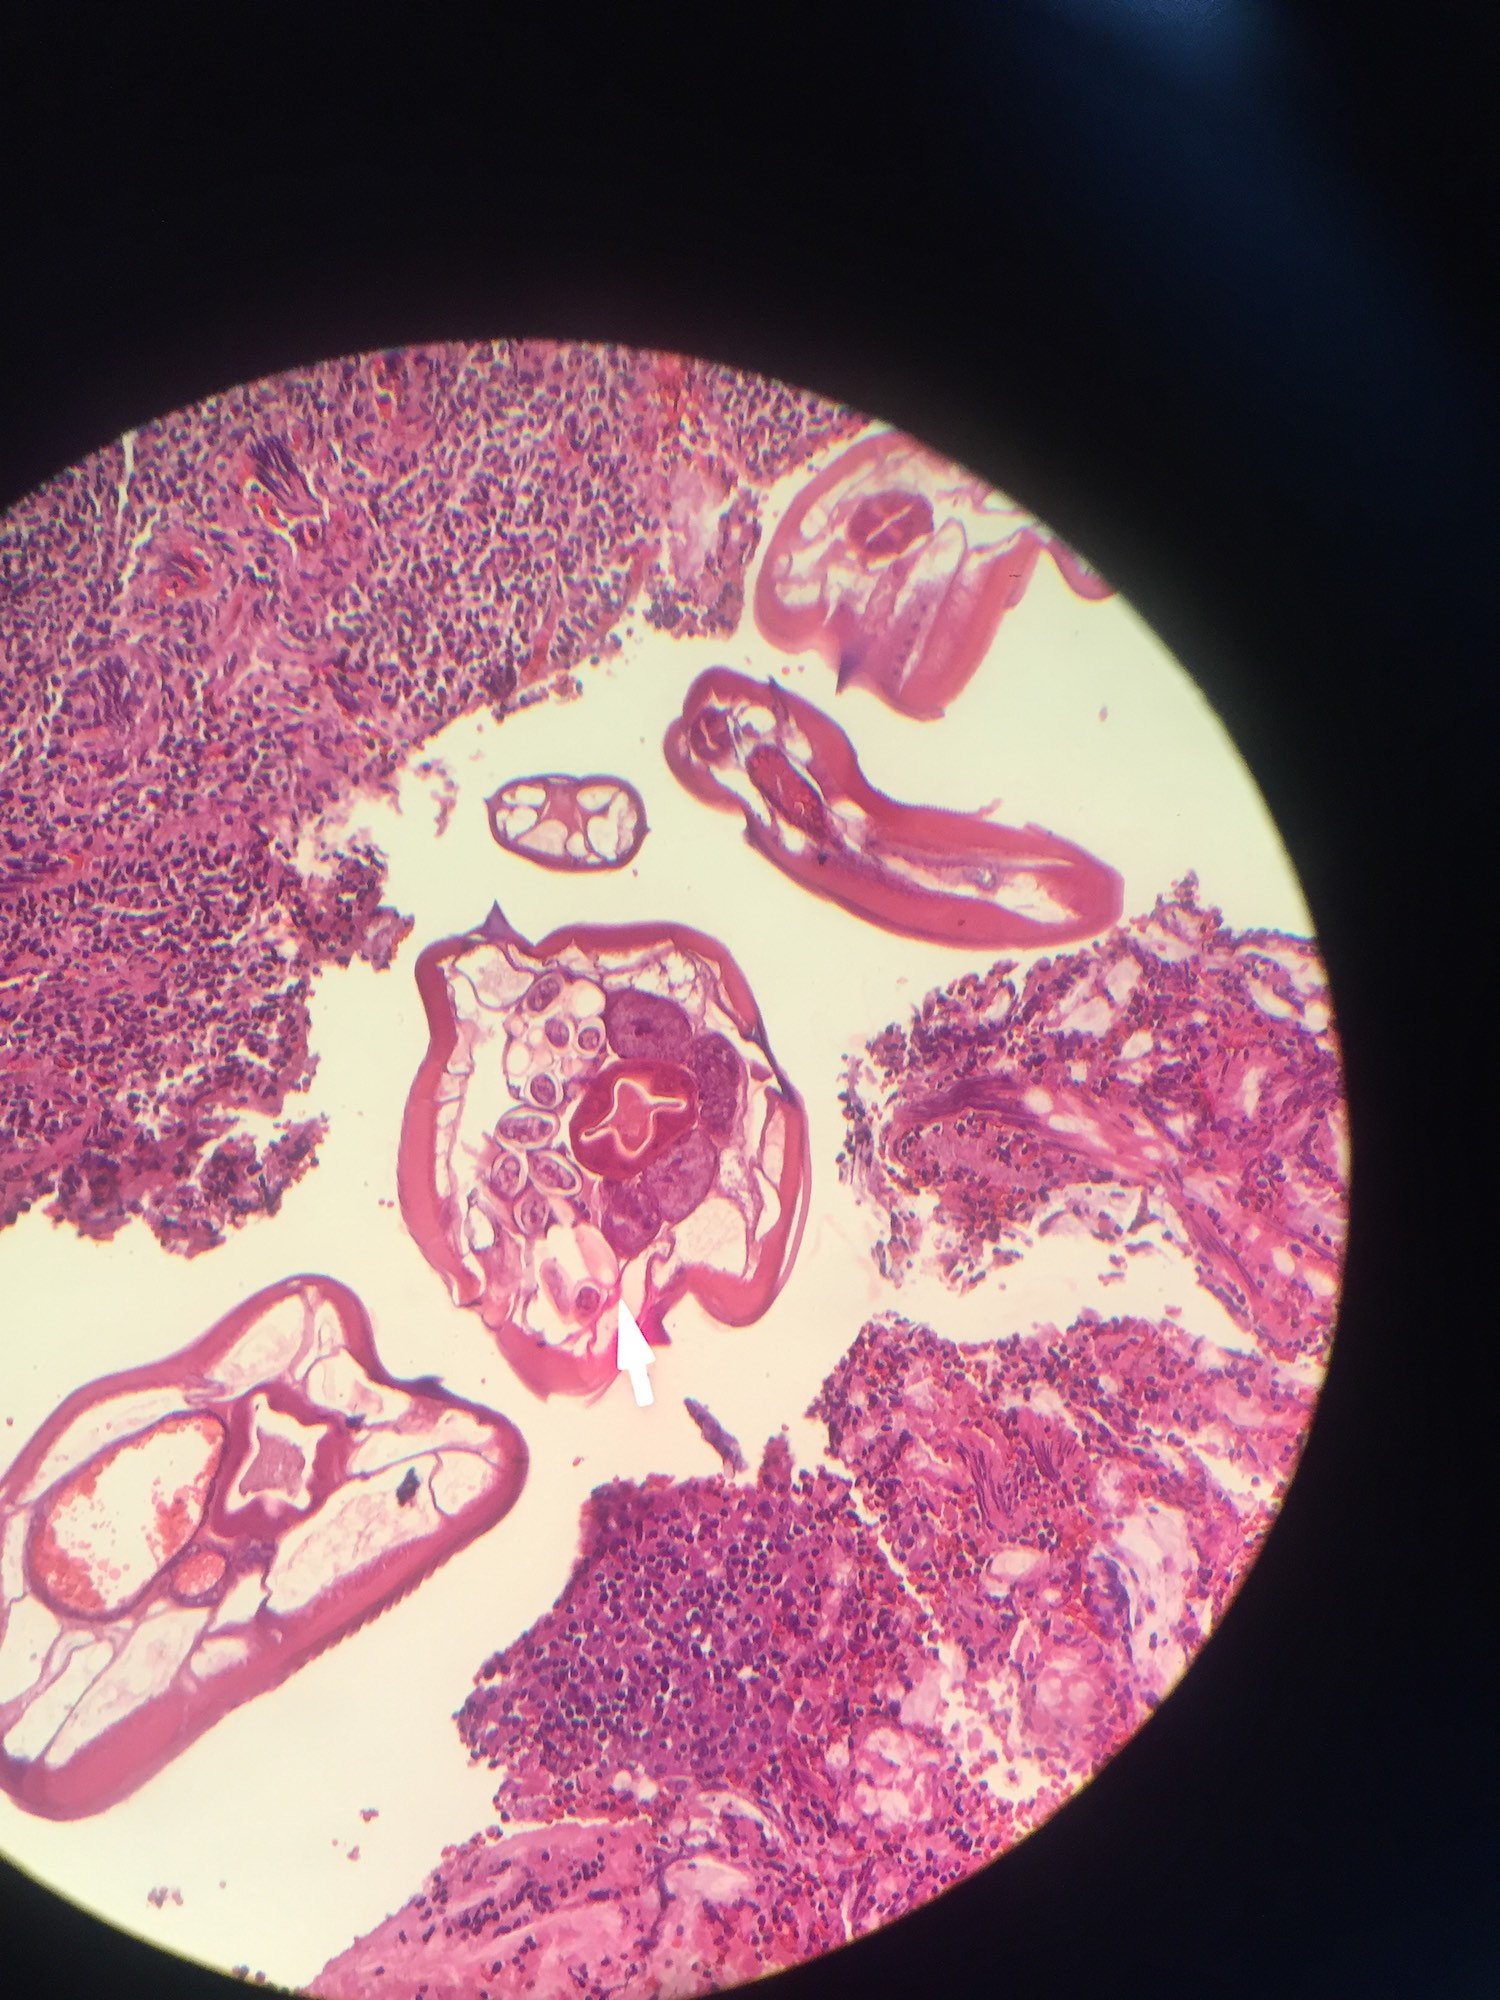 enterobius vermicularis appendix histology)